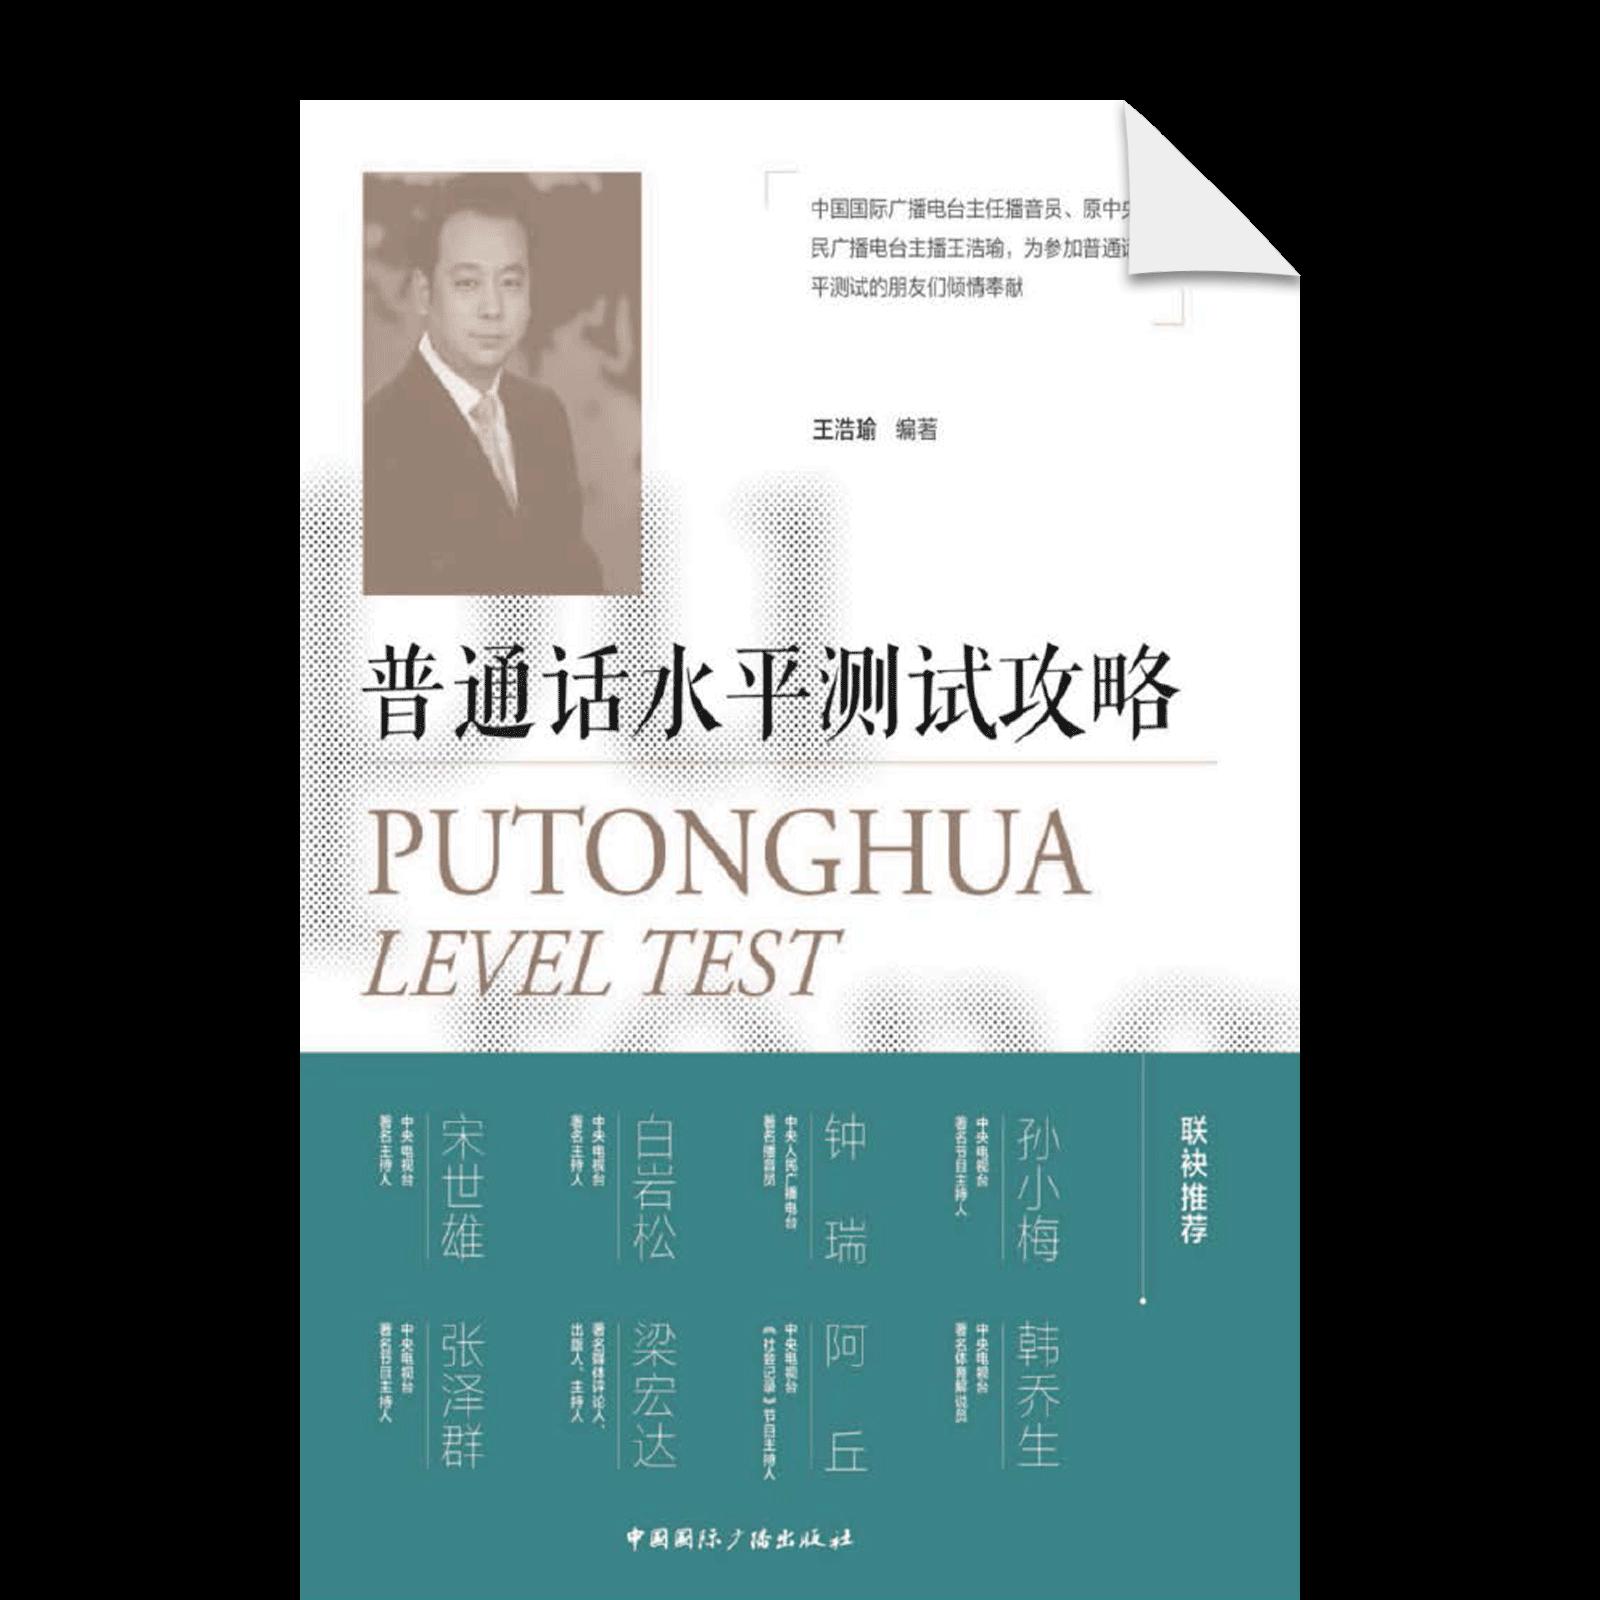 Putonghua Shuiping Ceshi Zhenglve